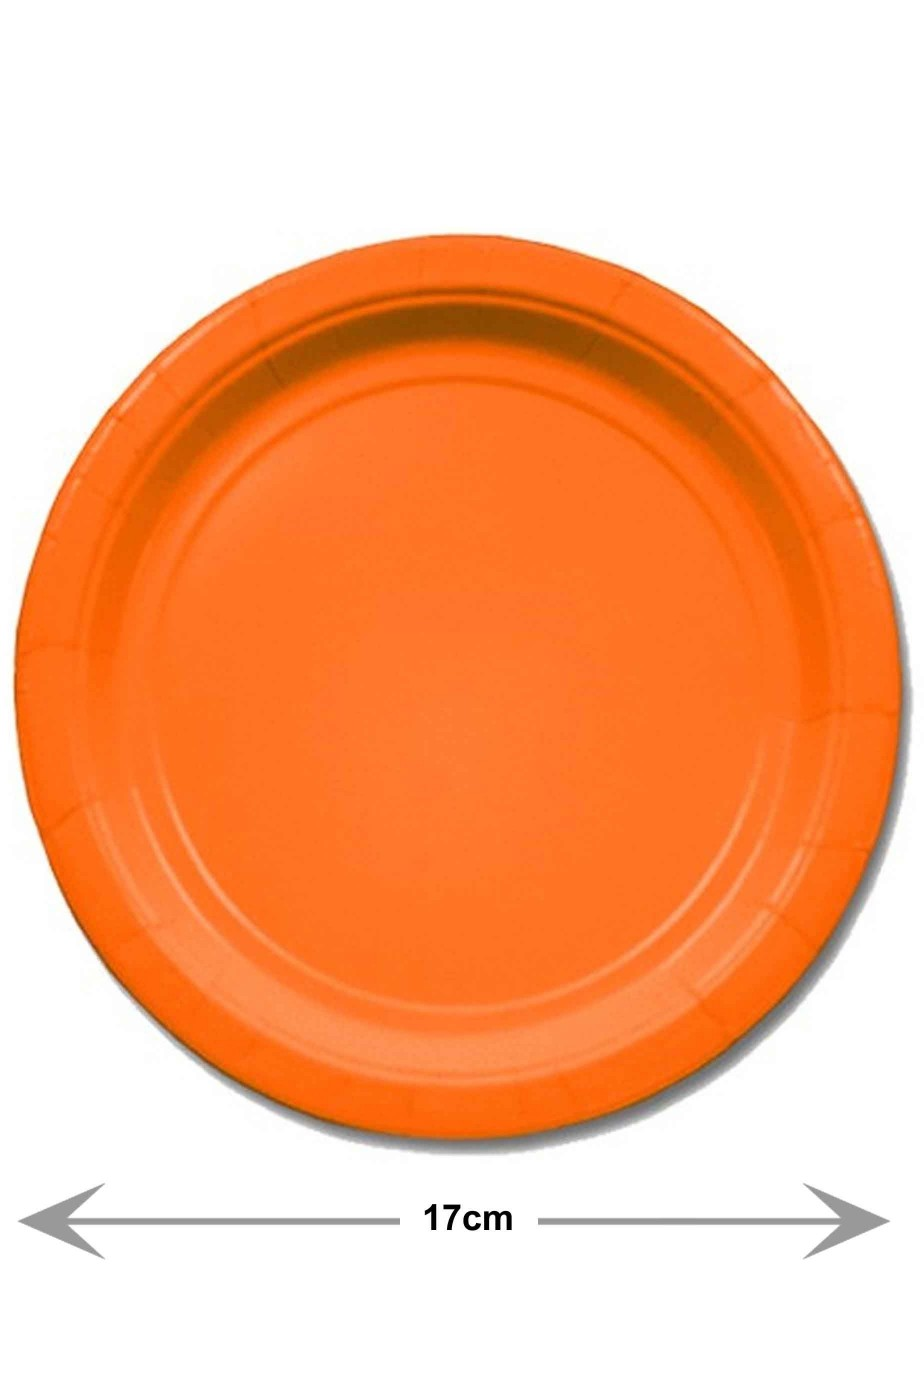 Piatti di carta arancioni da party da dessert 8 piatti, 17cm